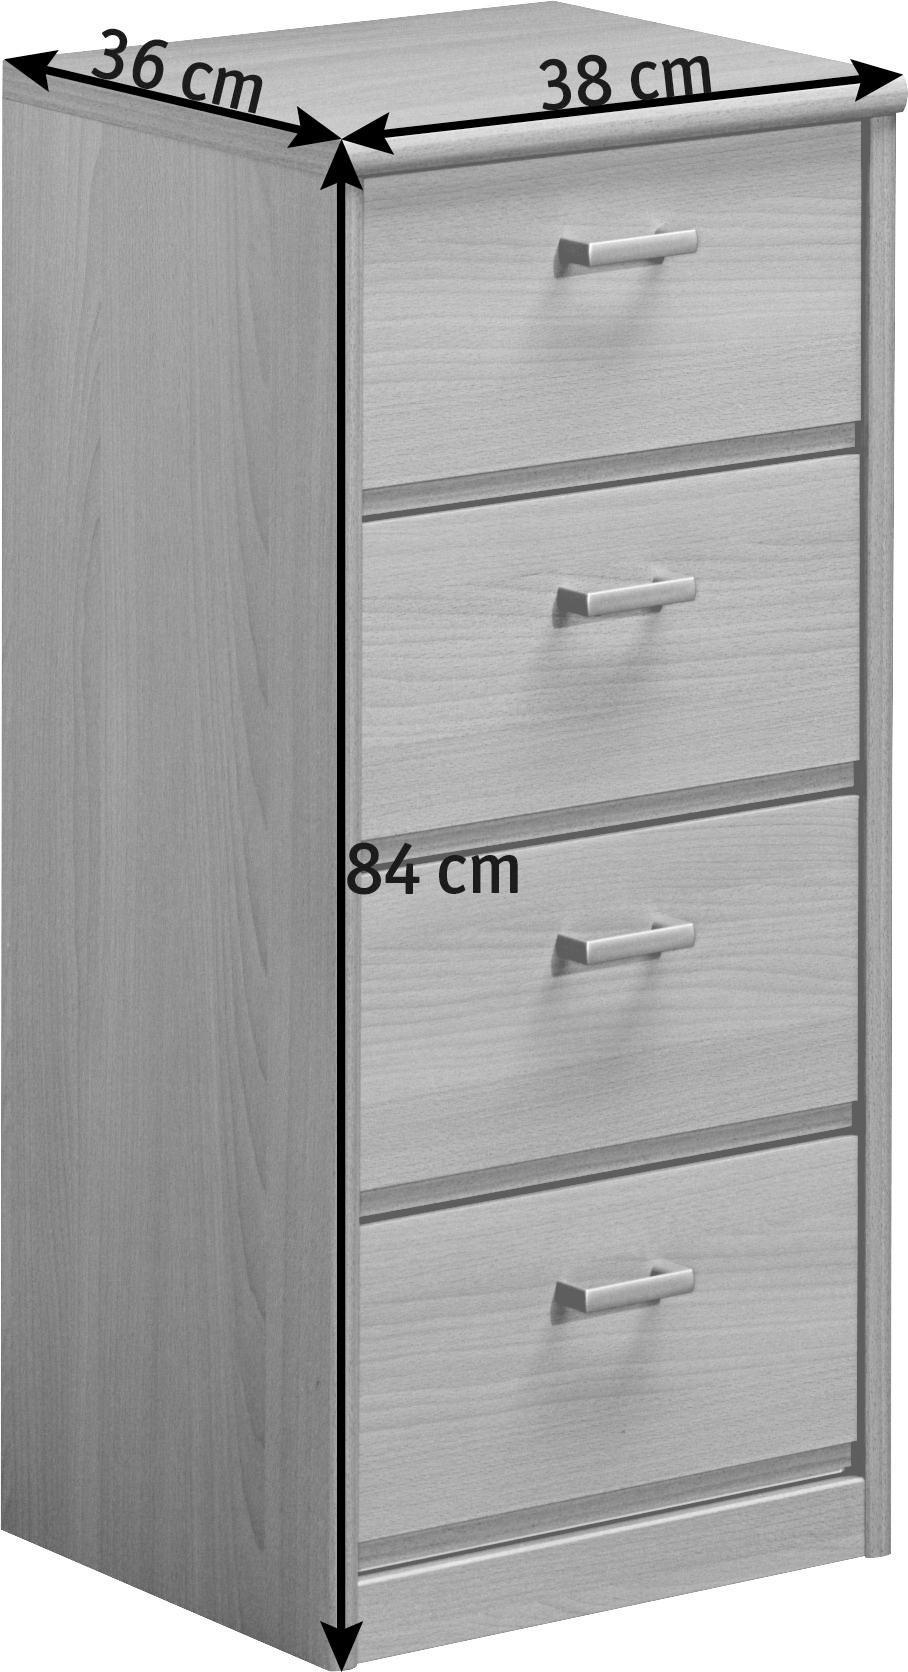 KOMMODE in Ahornfarben - Ahornfarben/Alufarben, KONVENTIONELL, Holzwerkstoff/Kunststoff (38/84/36cm) - CS SCHMAL